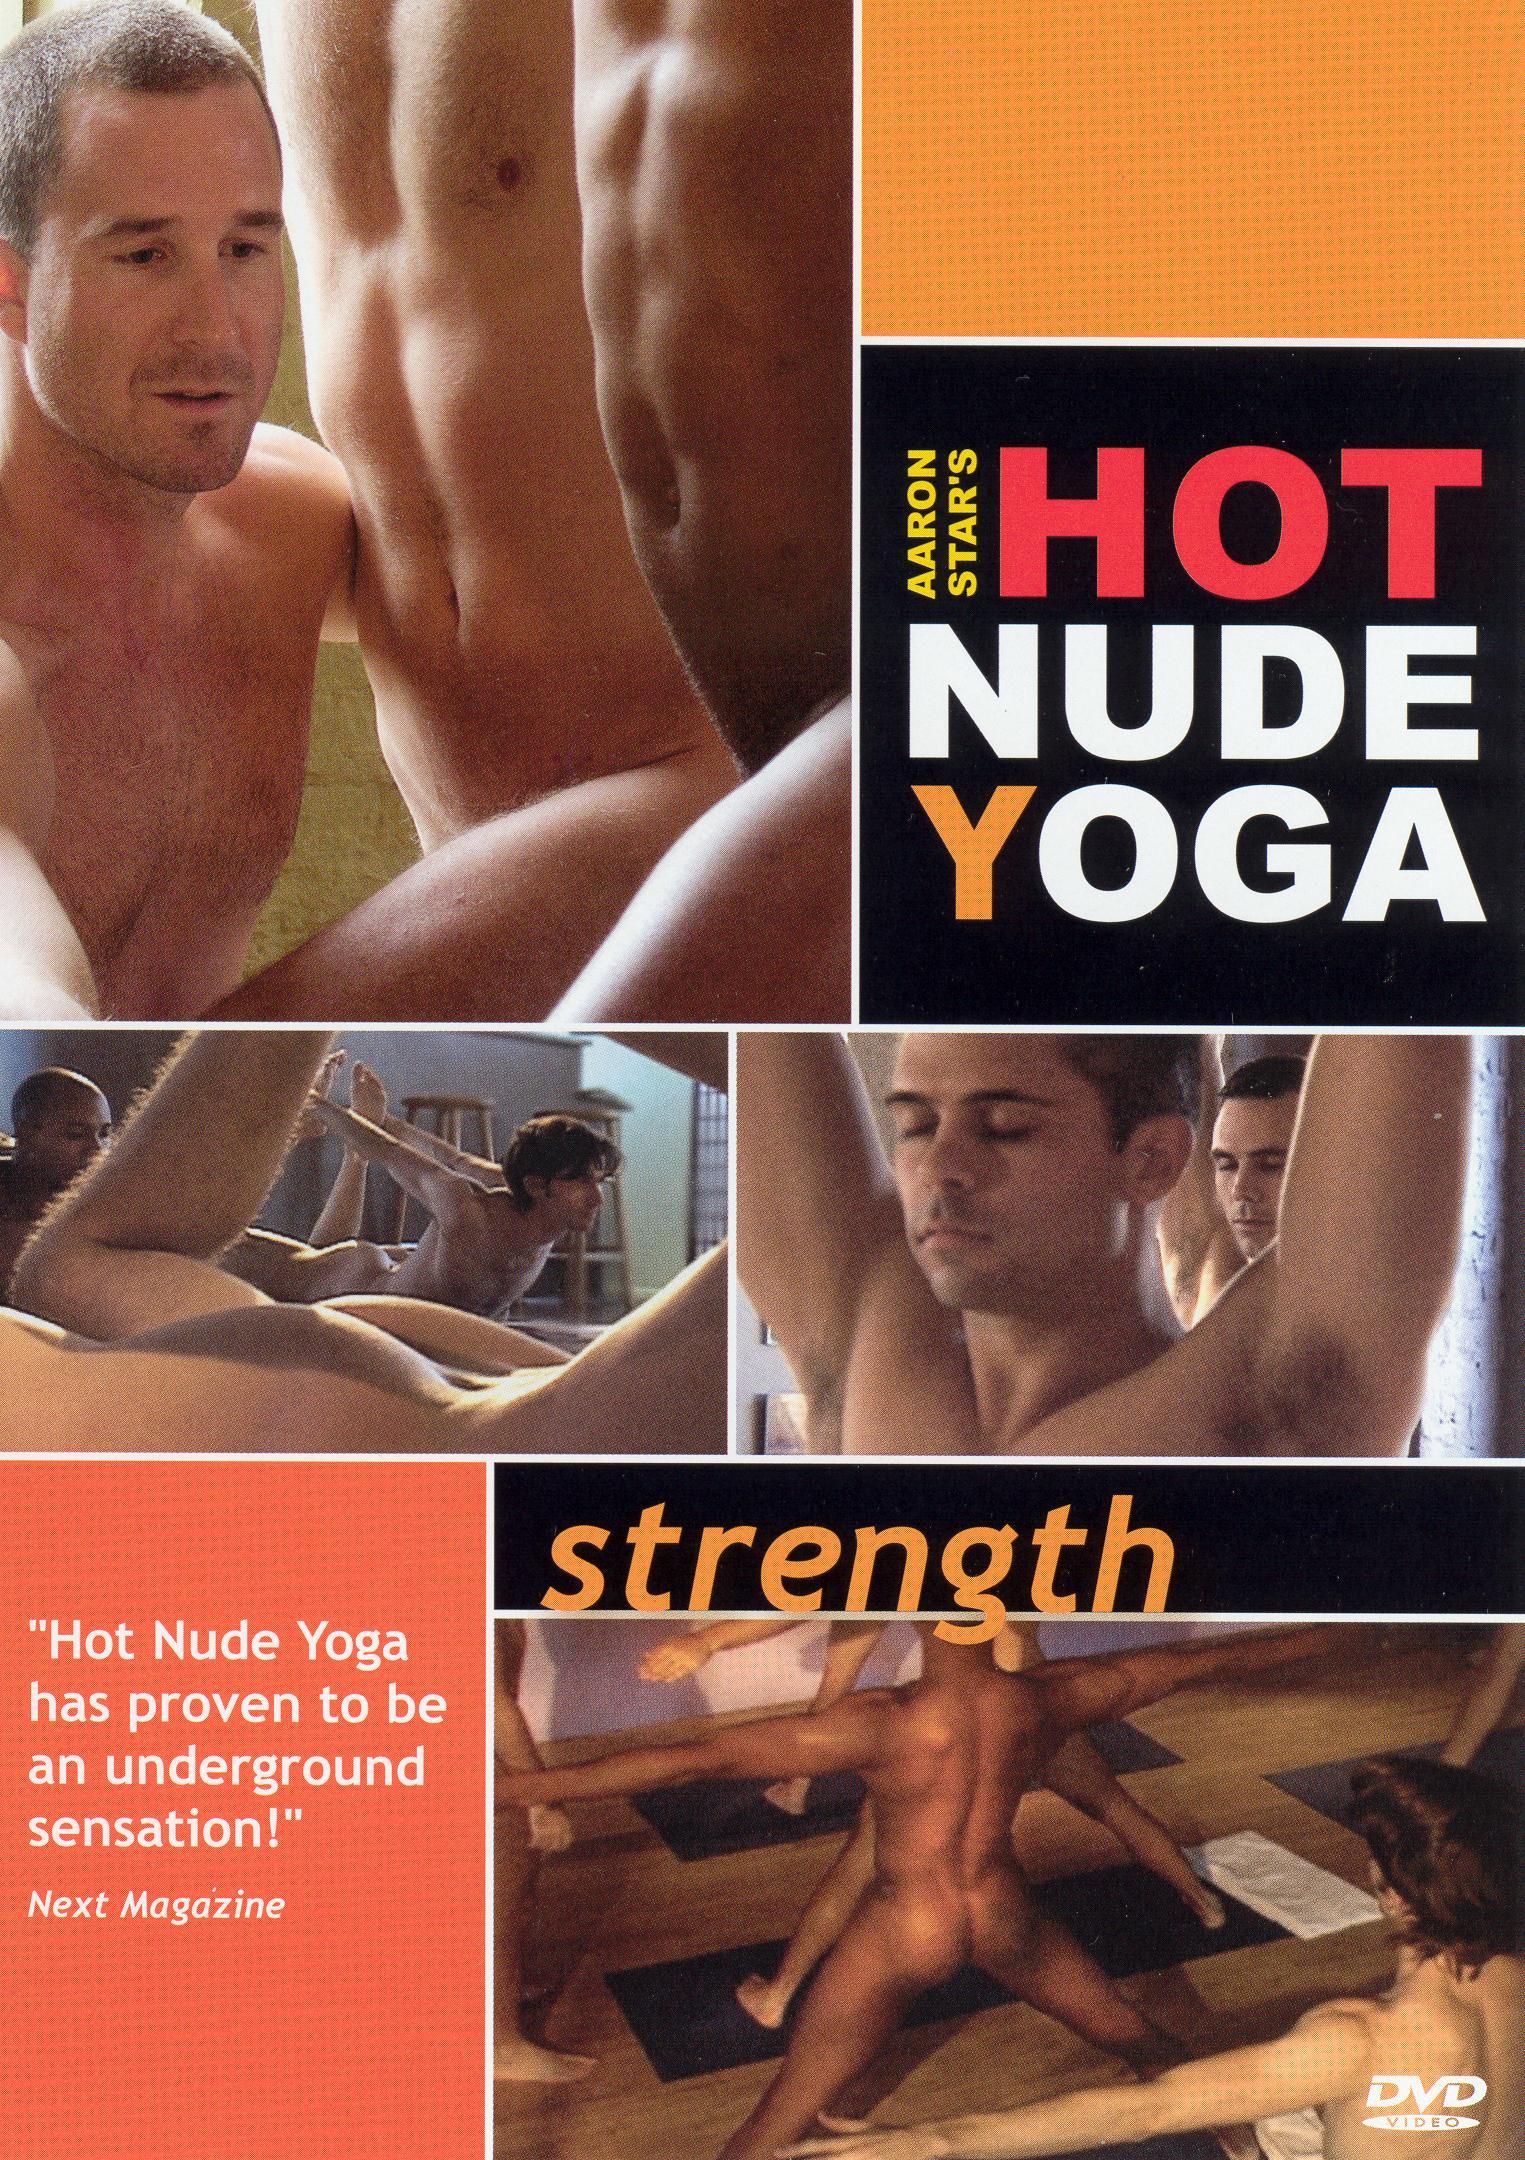 Hot Nude Yoga: Strength